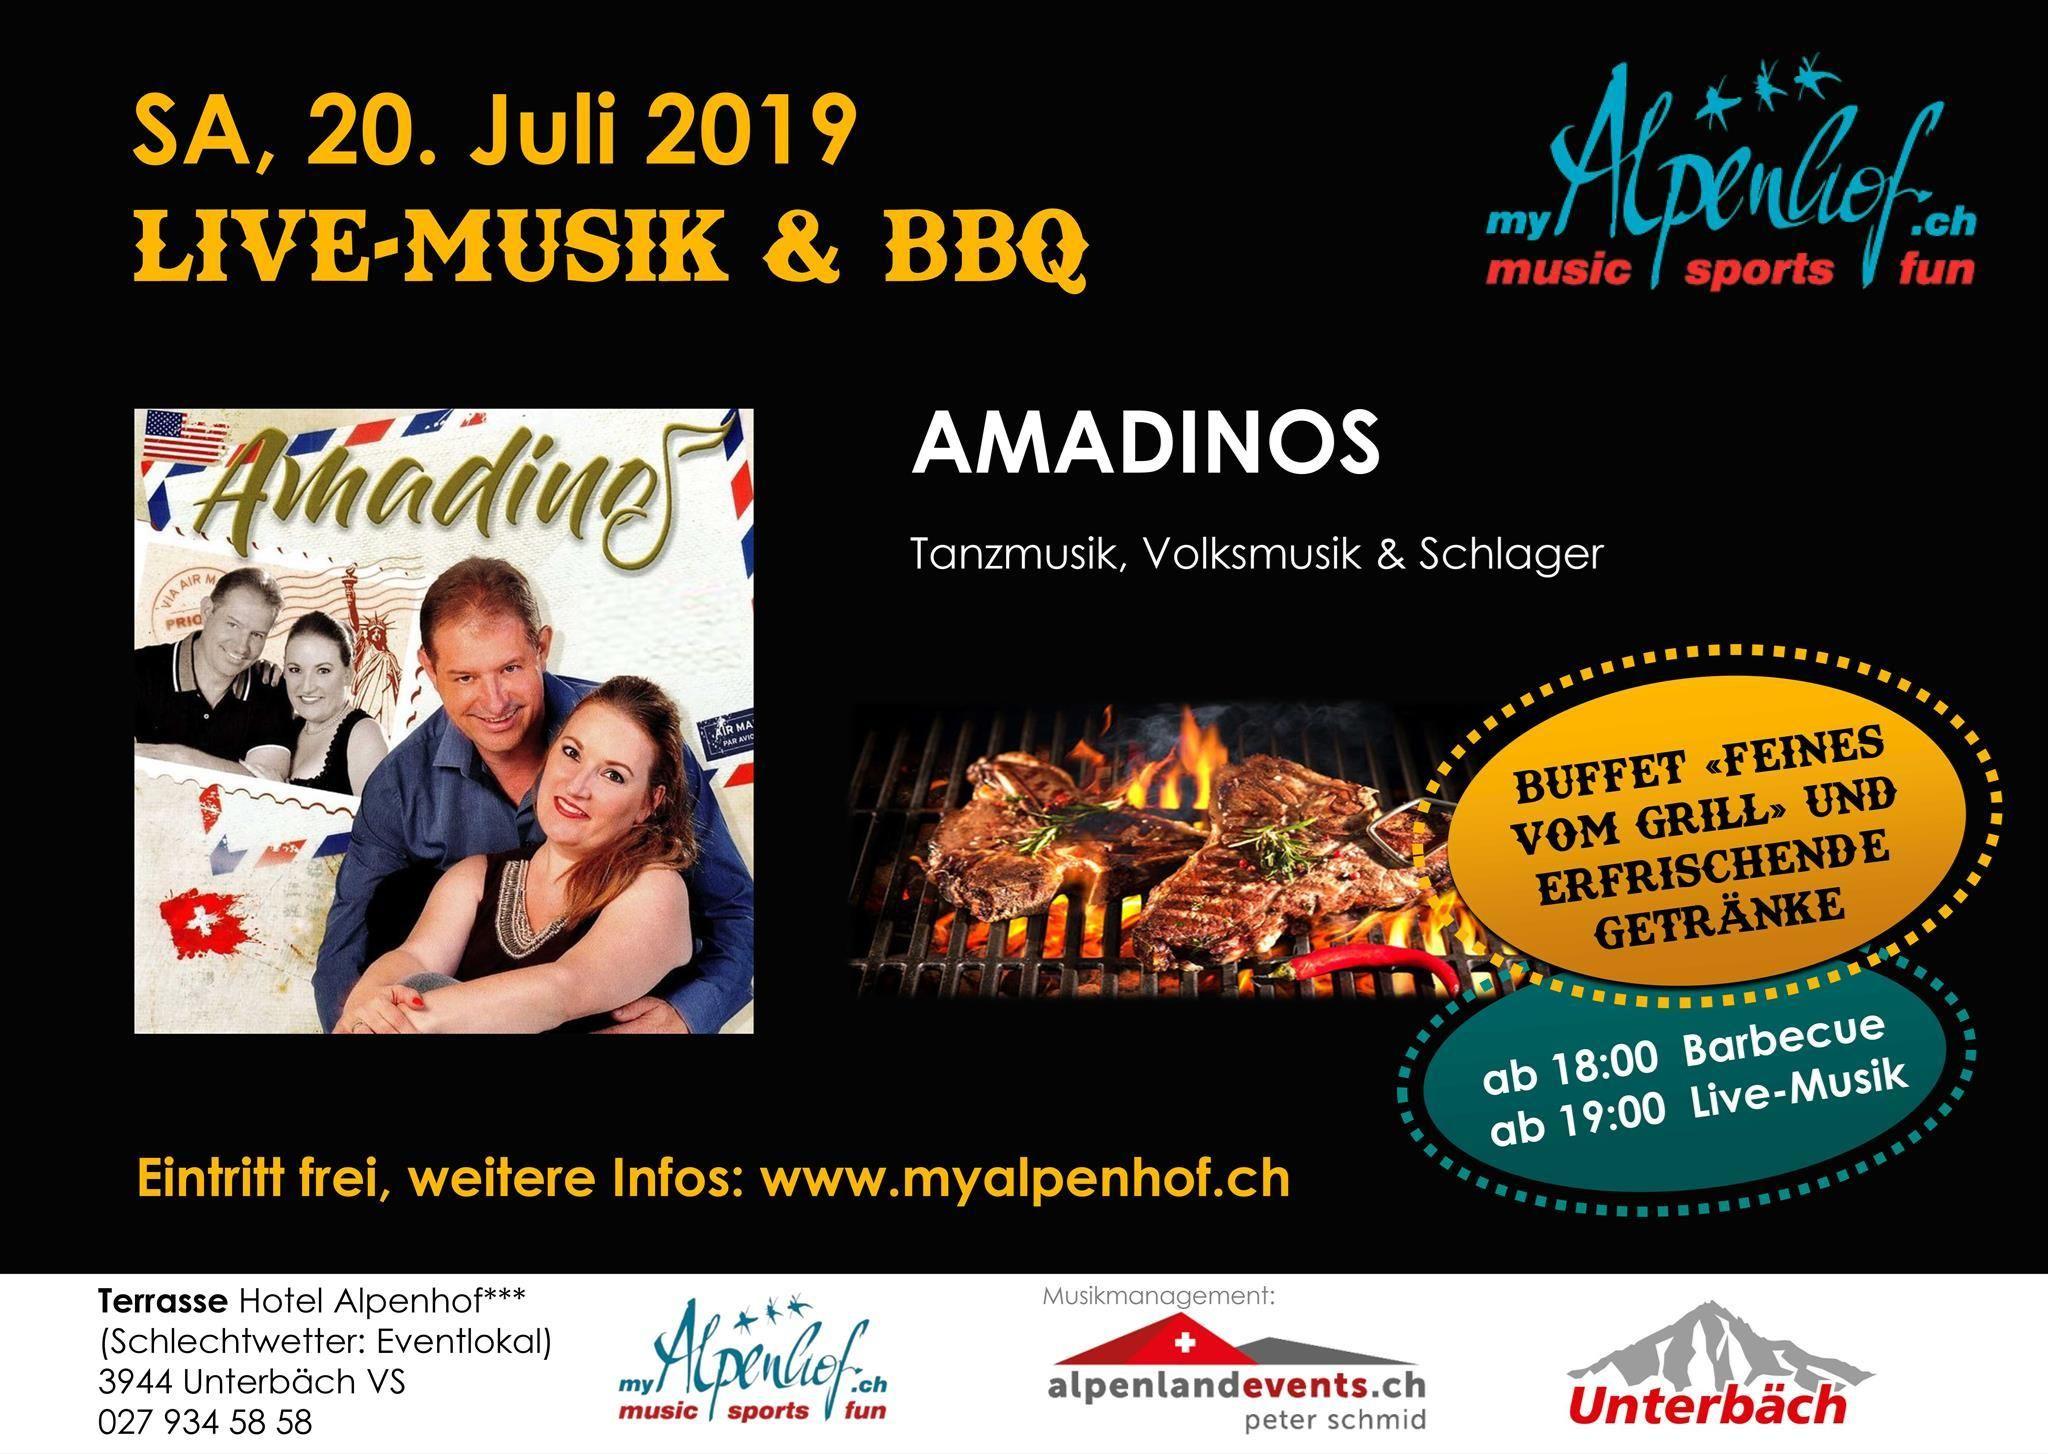 Live-Musik & BBQ im Alpenhof:Amadinos